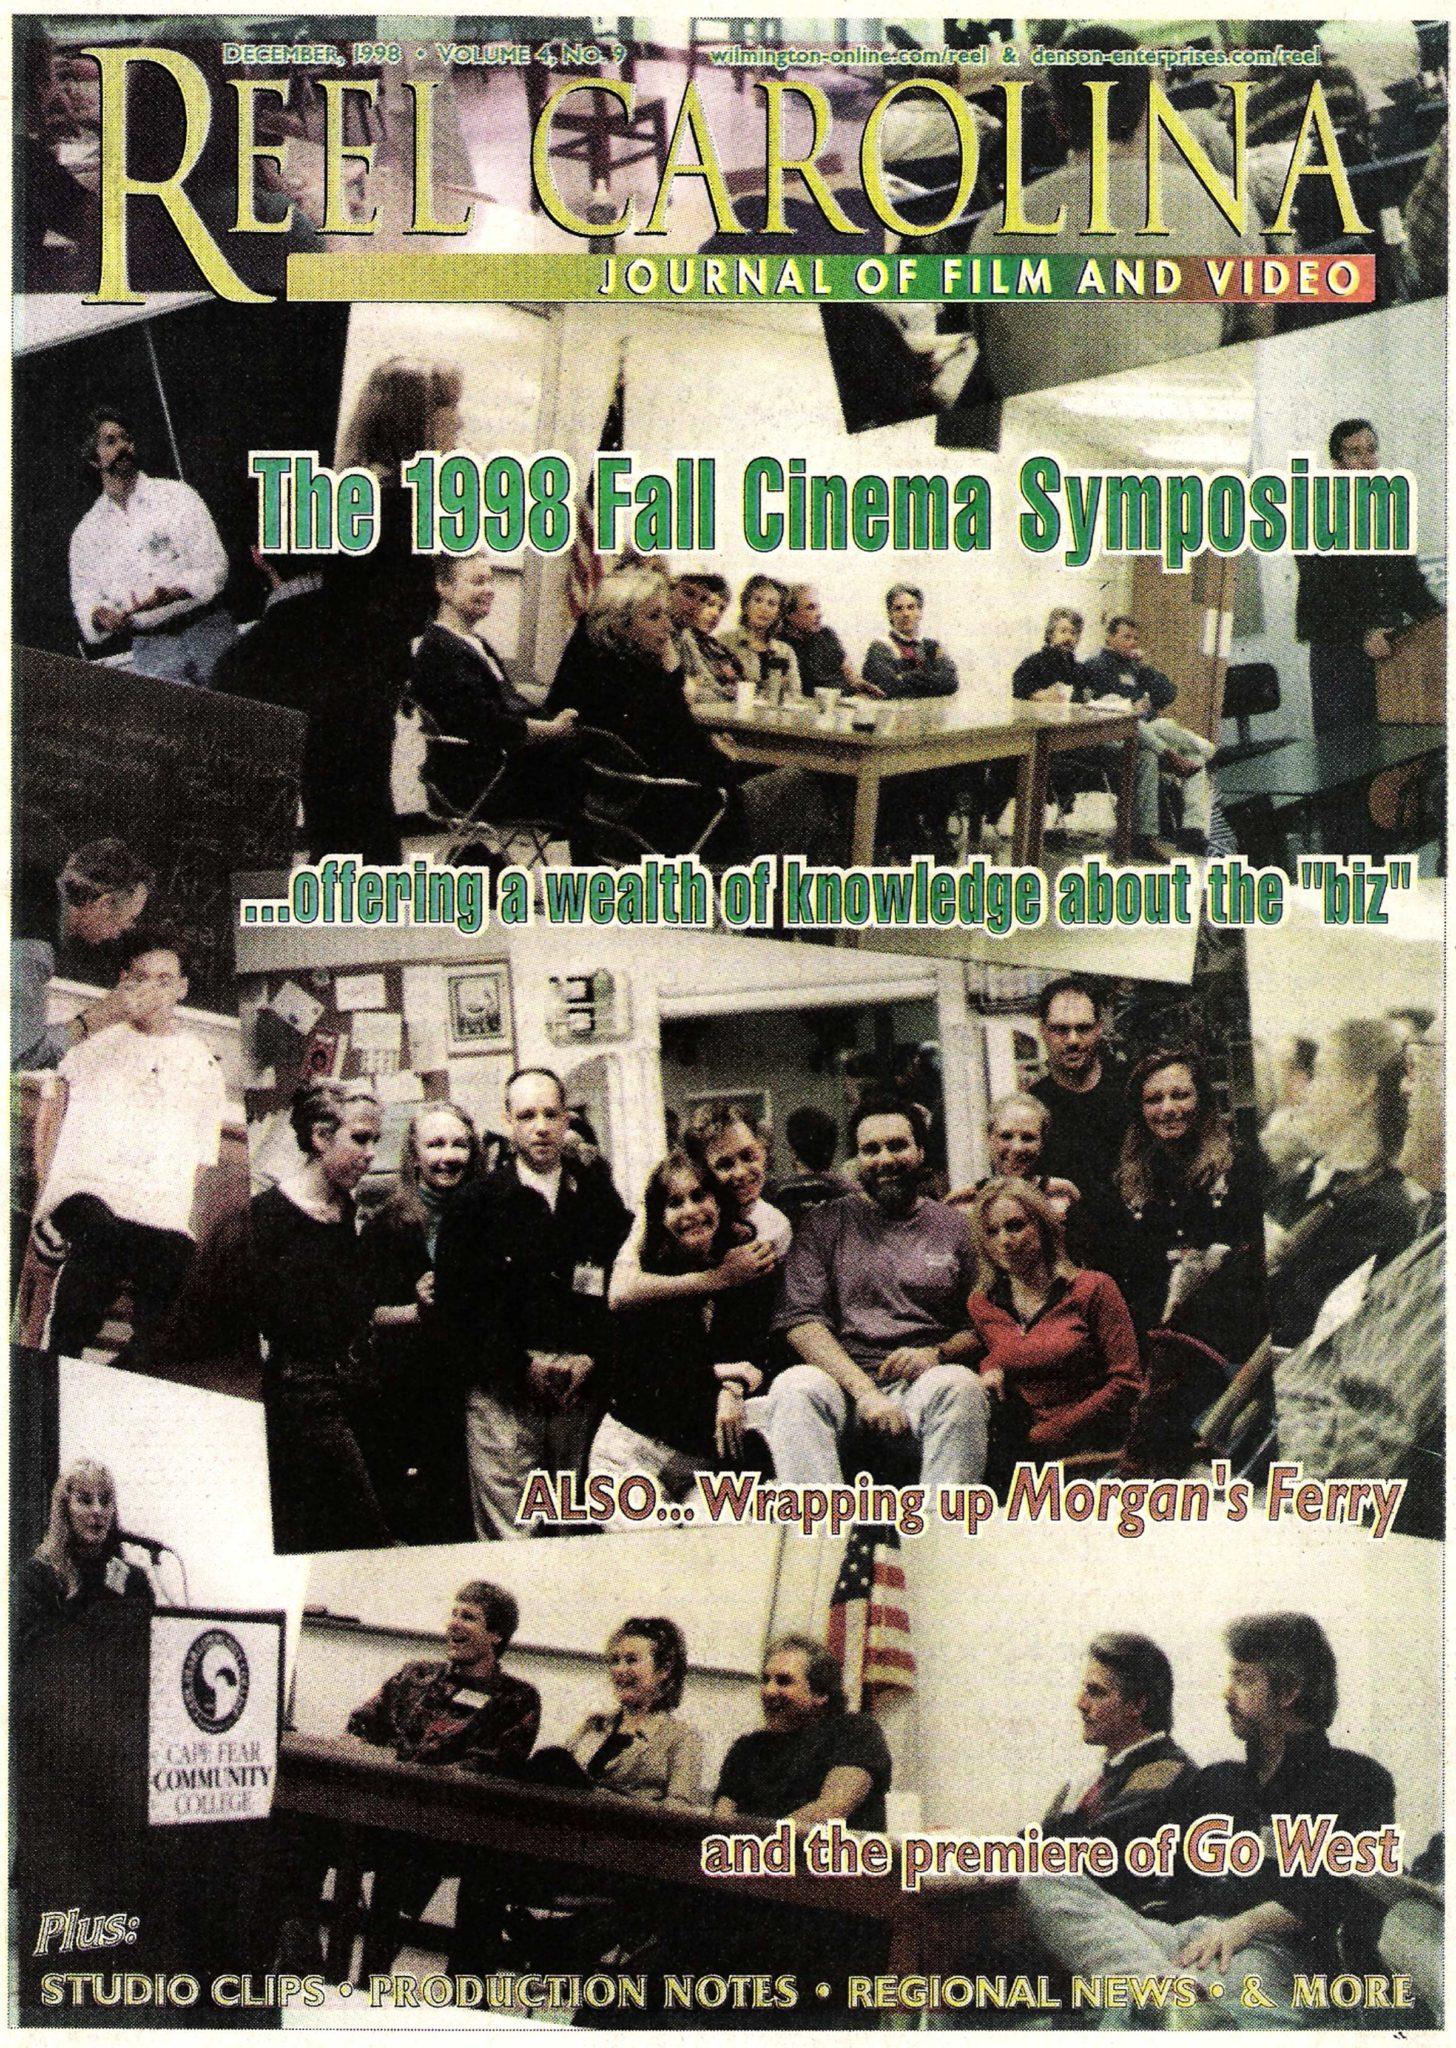 1999 Fall Cinema Symposium - Wilmington, NC